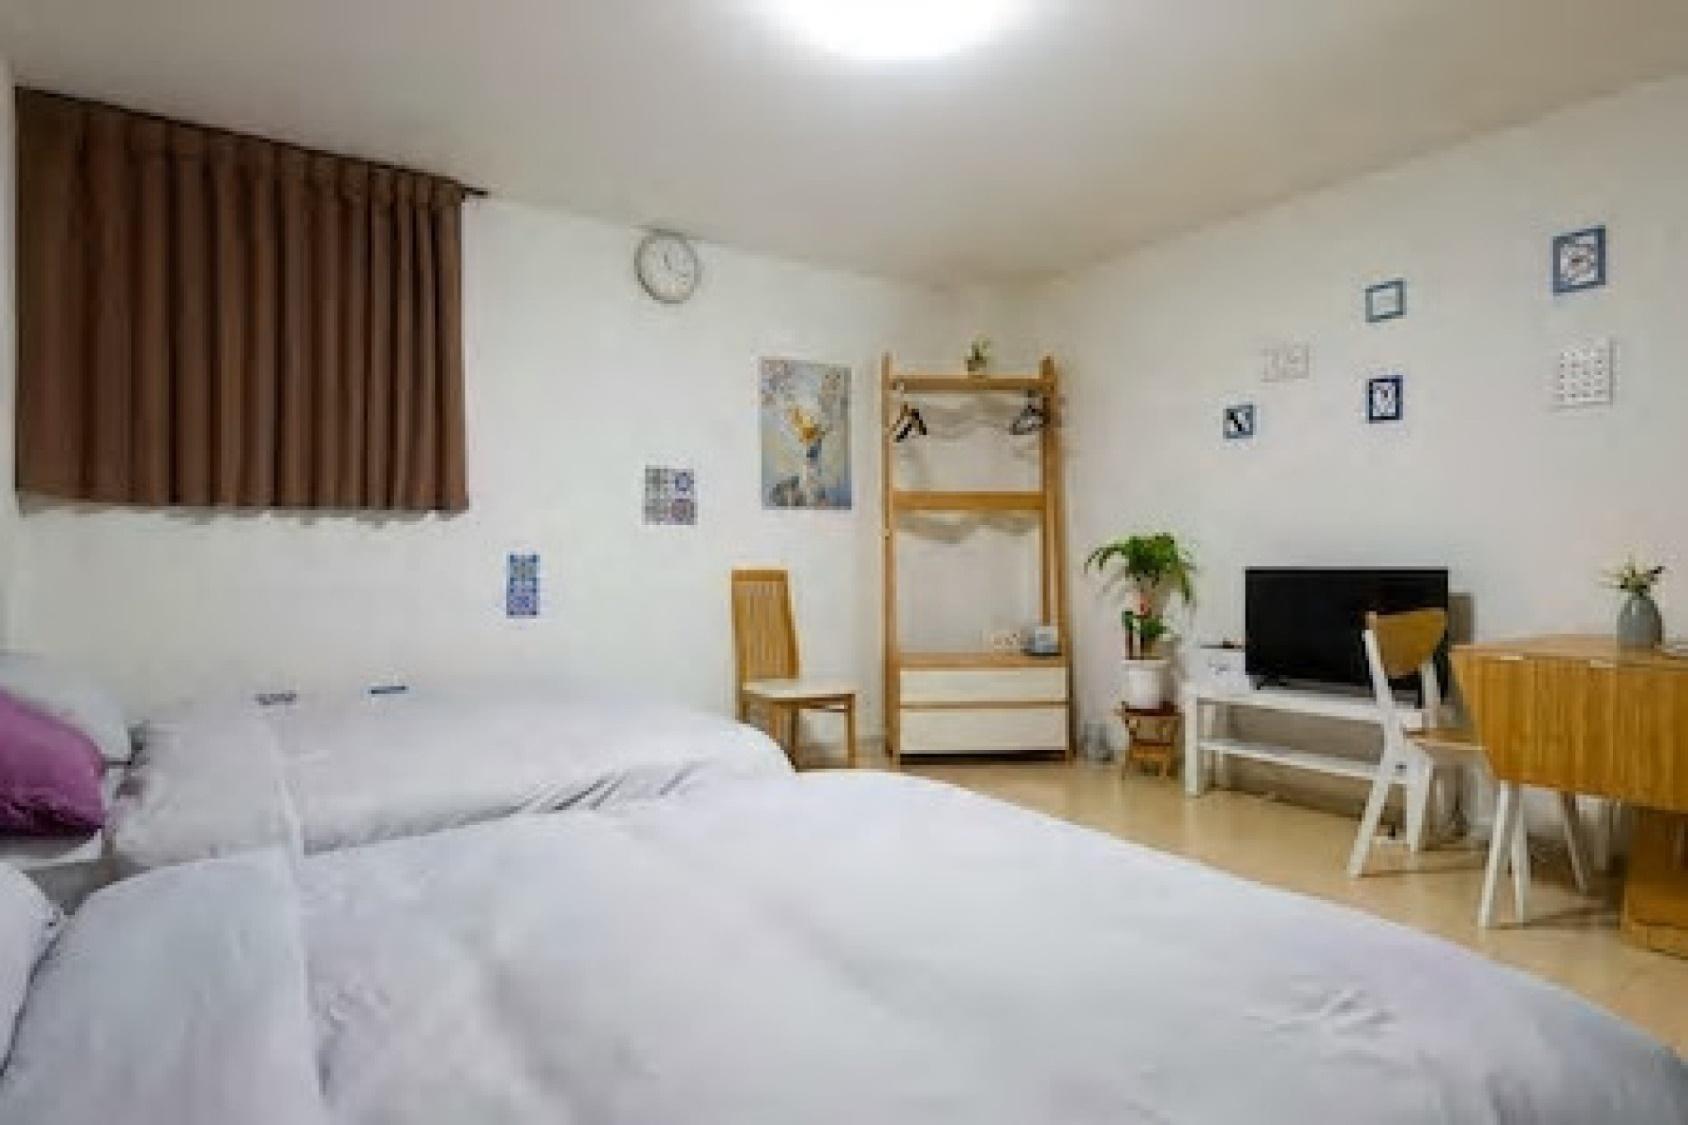 YOTUBA HOUSE【Vacation STAY提供】